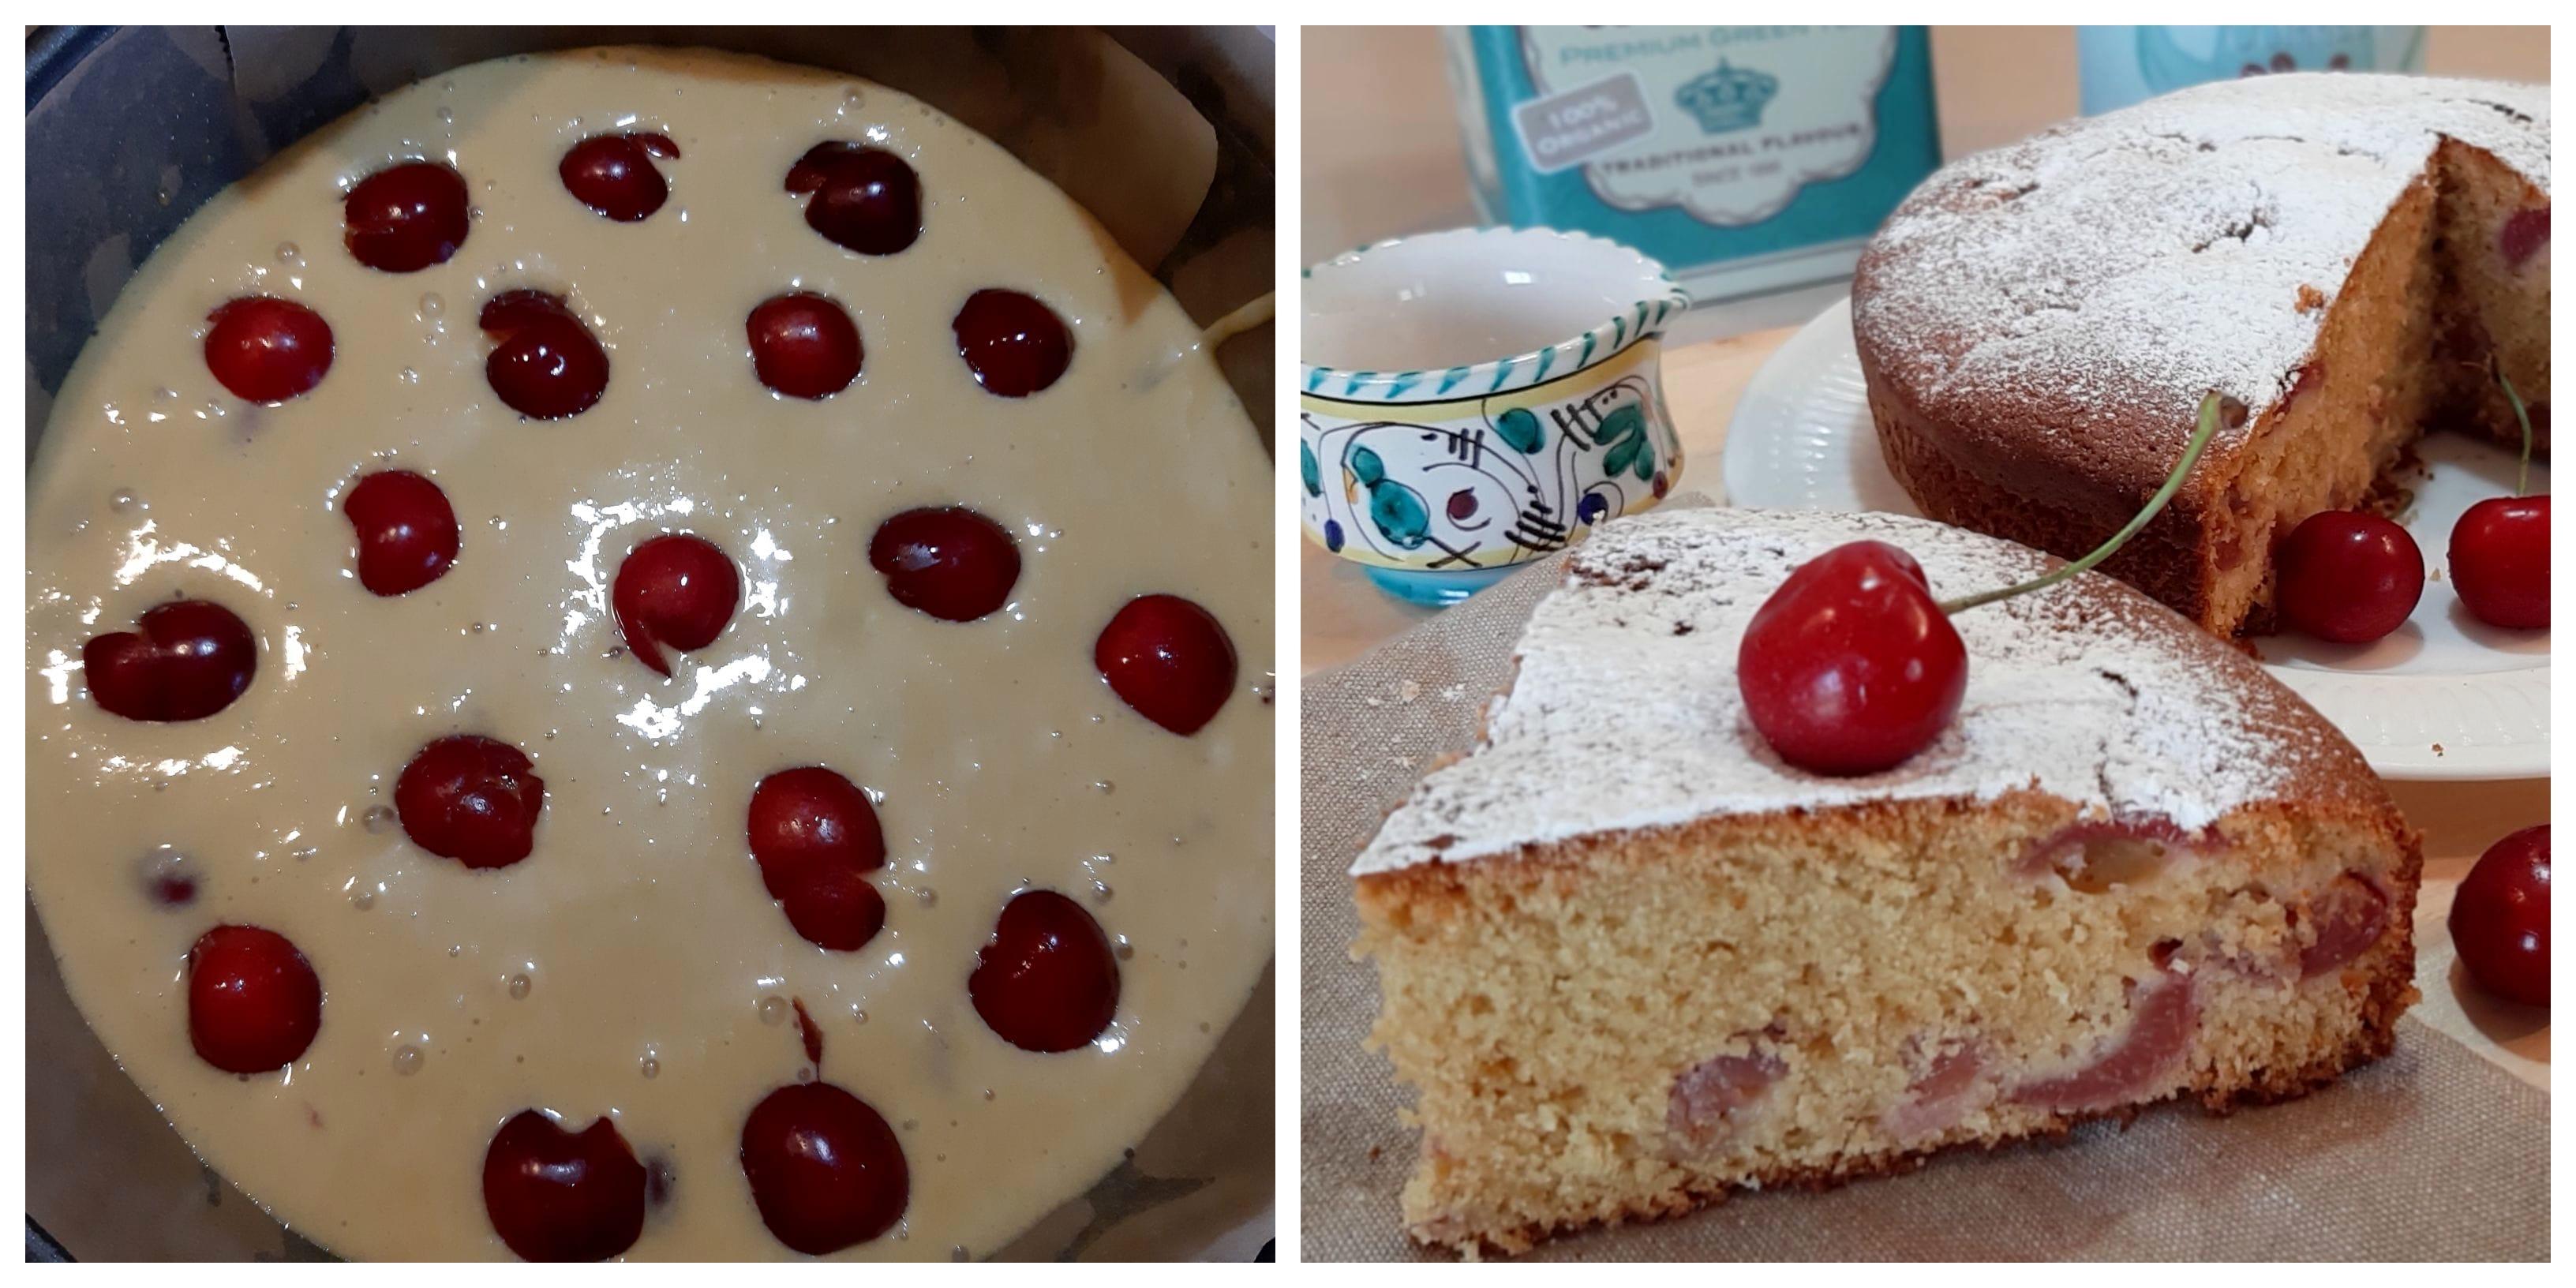 torta ciliegie cocco box@VG-2